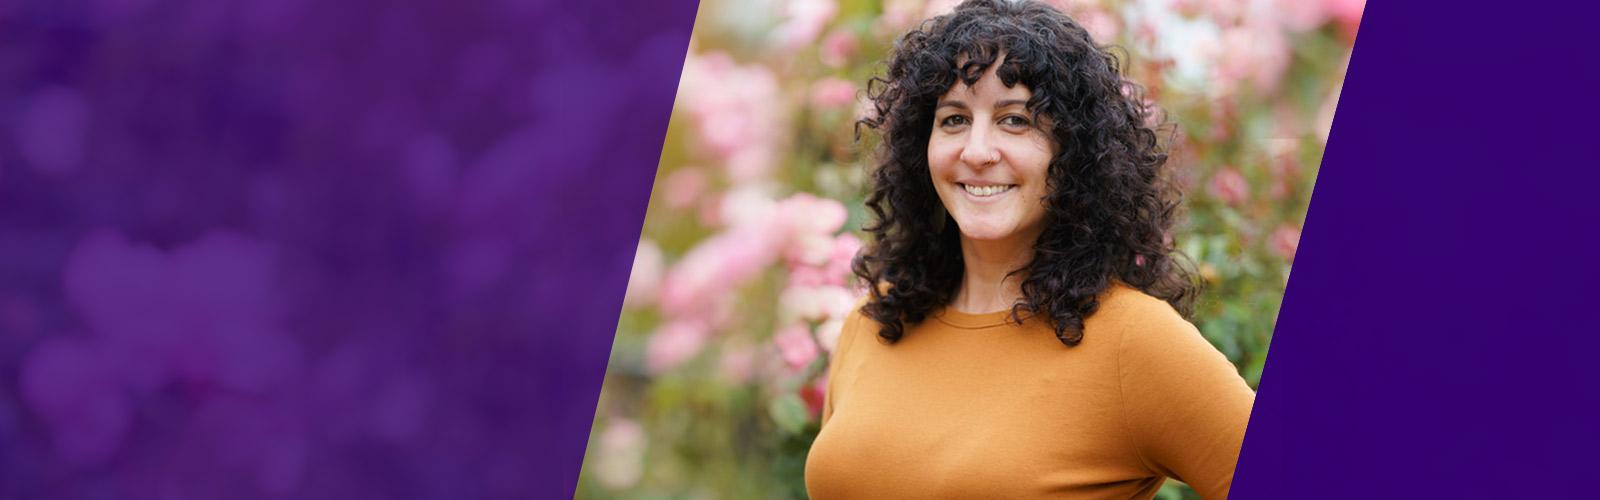 Anna Levu Fogel, UW Nutritional Sciences Student